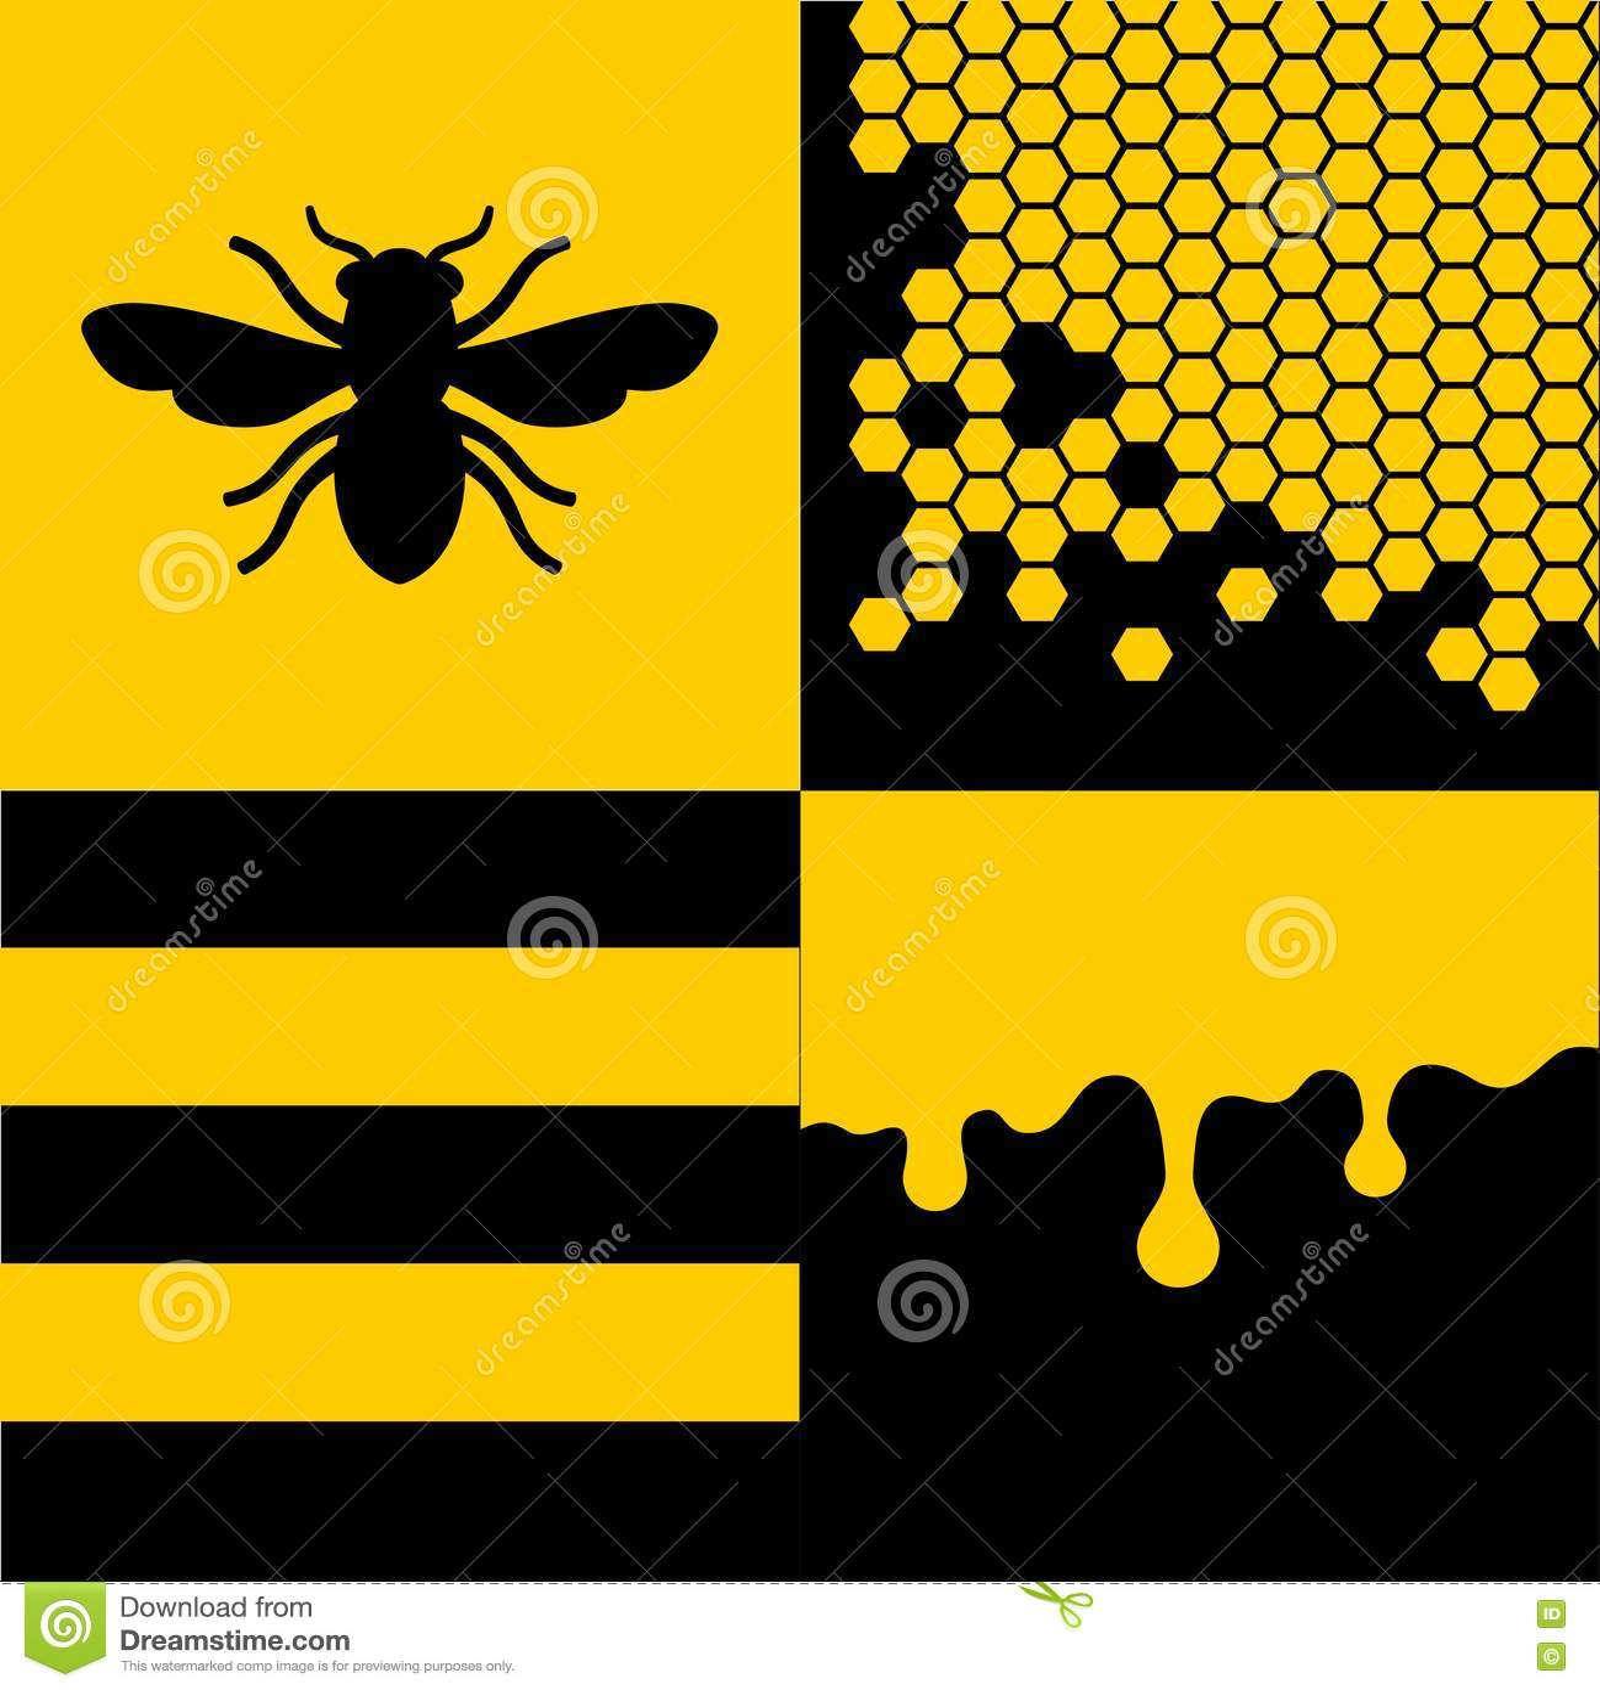 Bee Honeycells and Honey Patterns Set. Vector